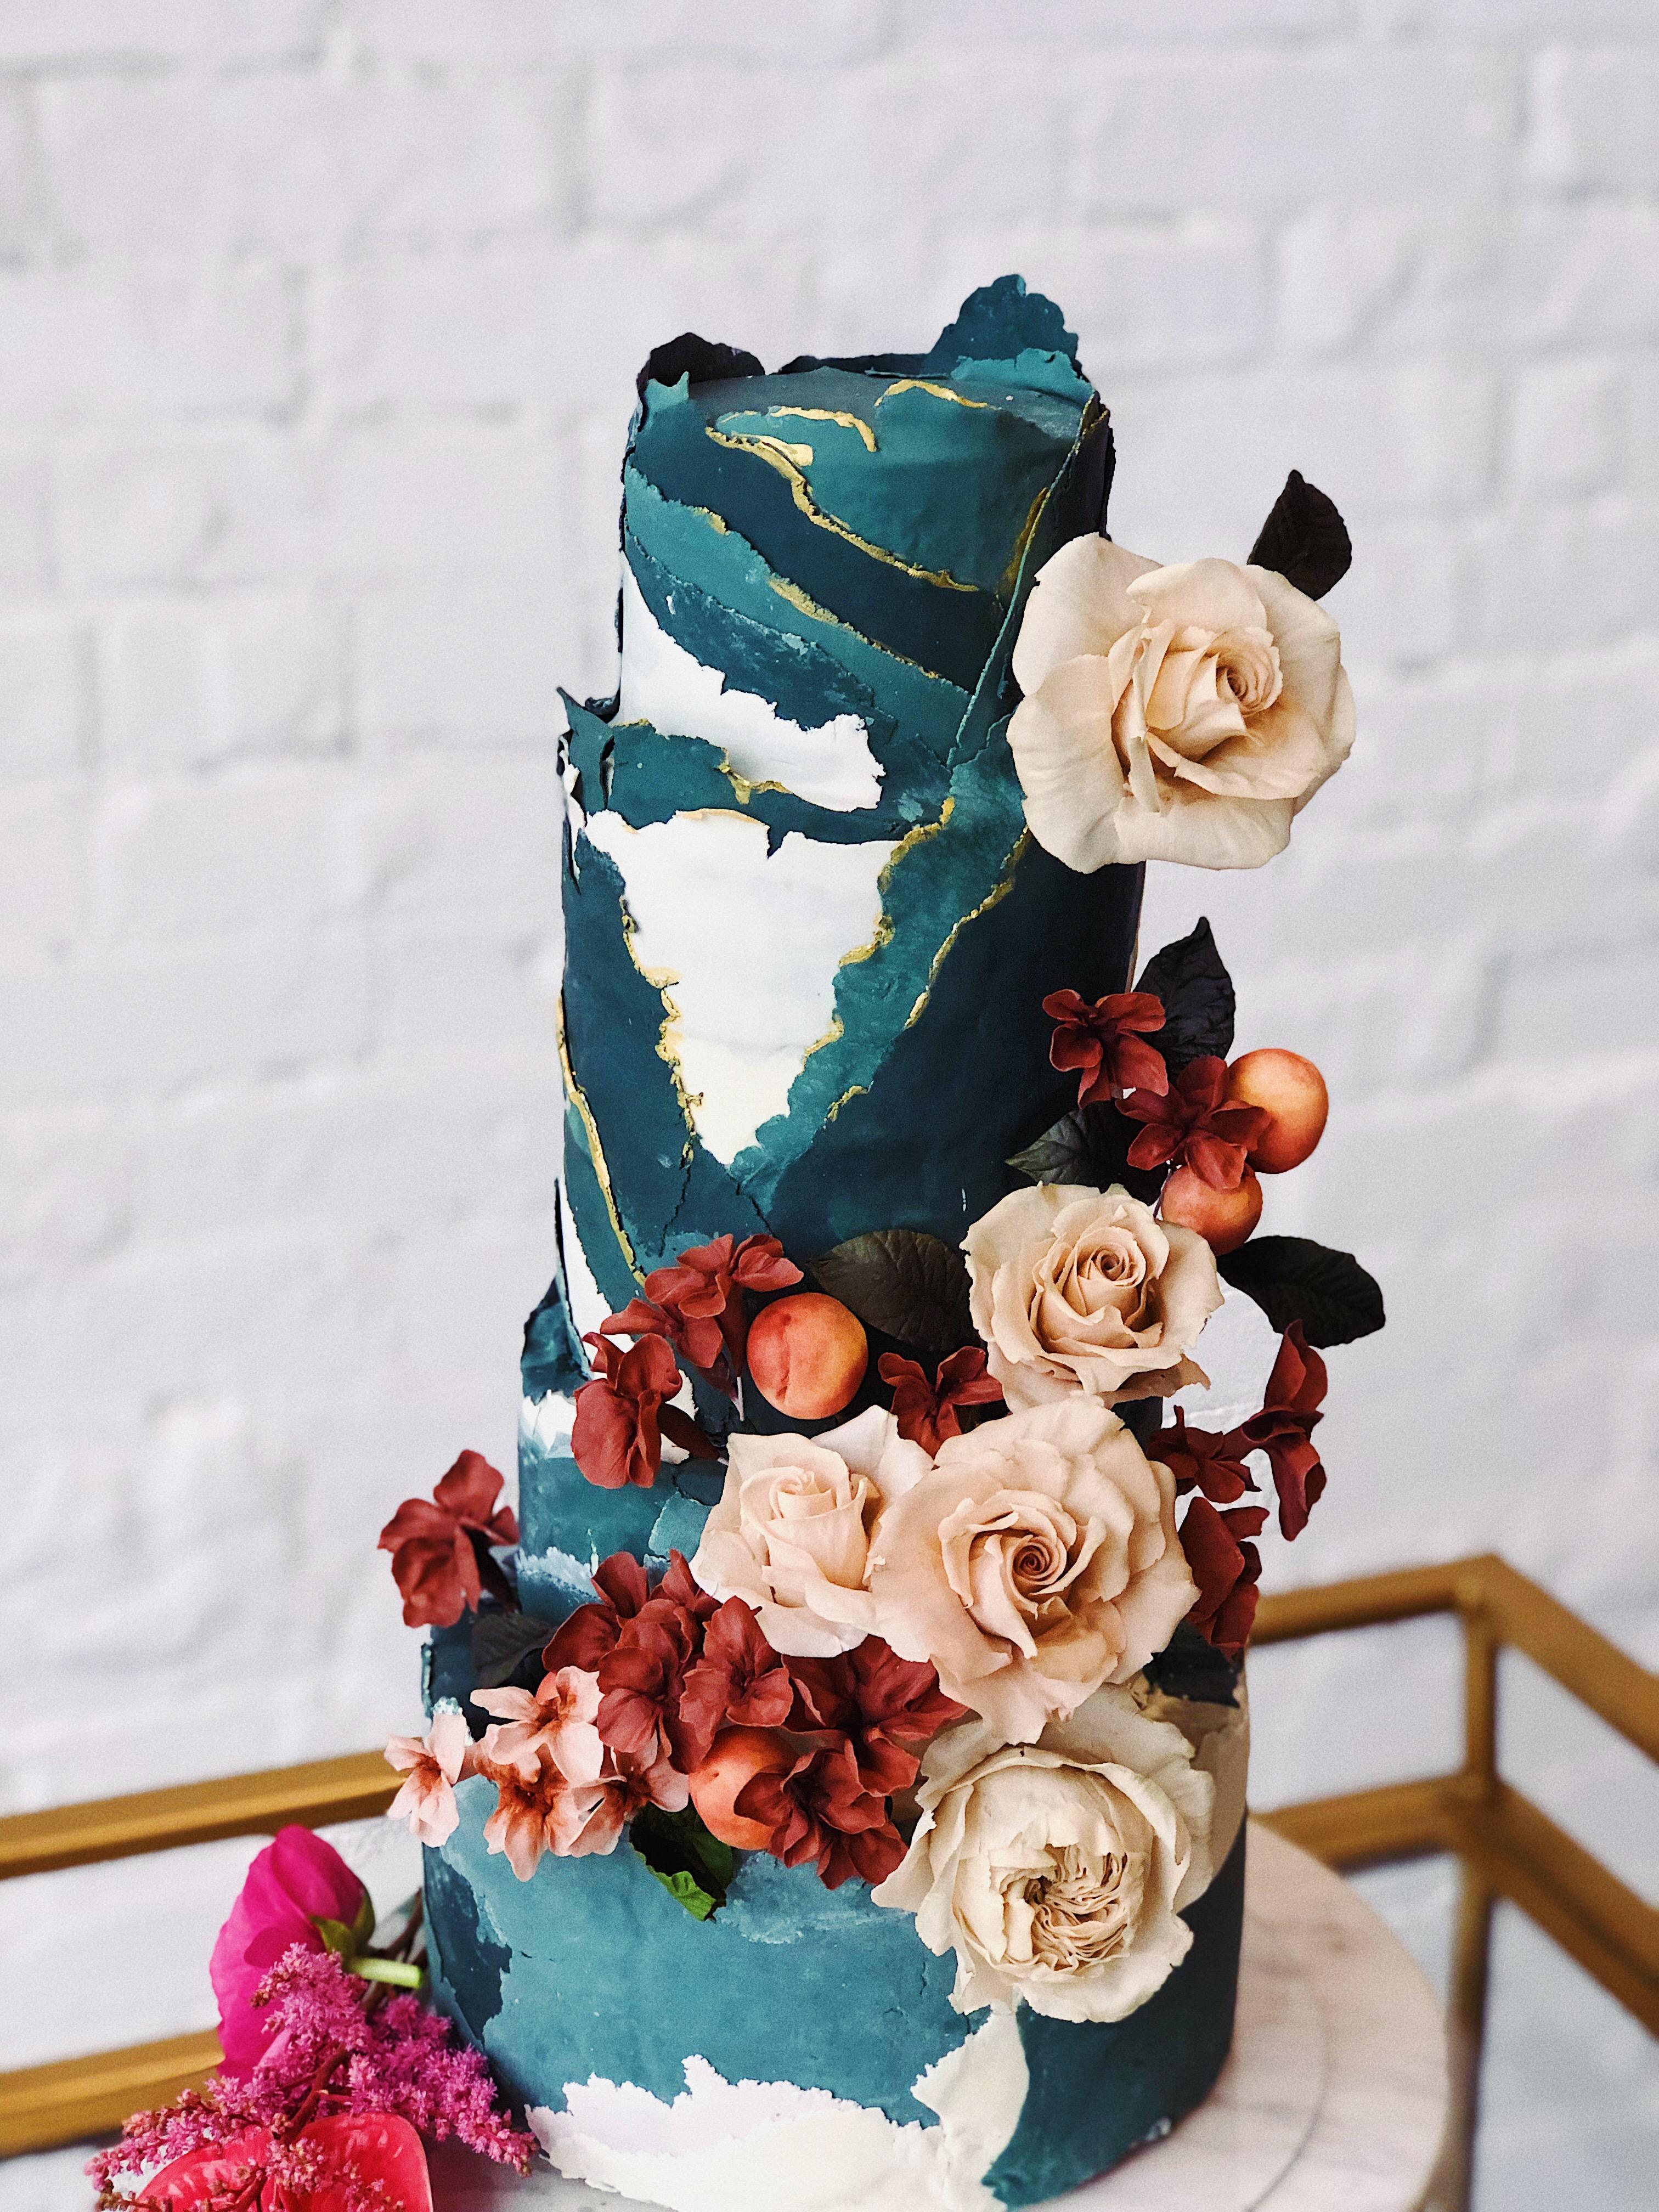 Ripped fondant turquoise cake